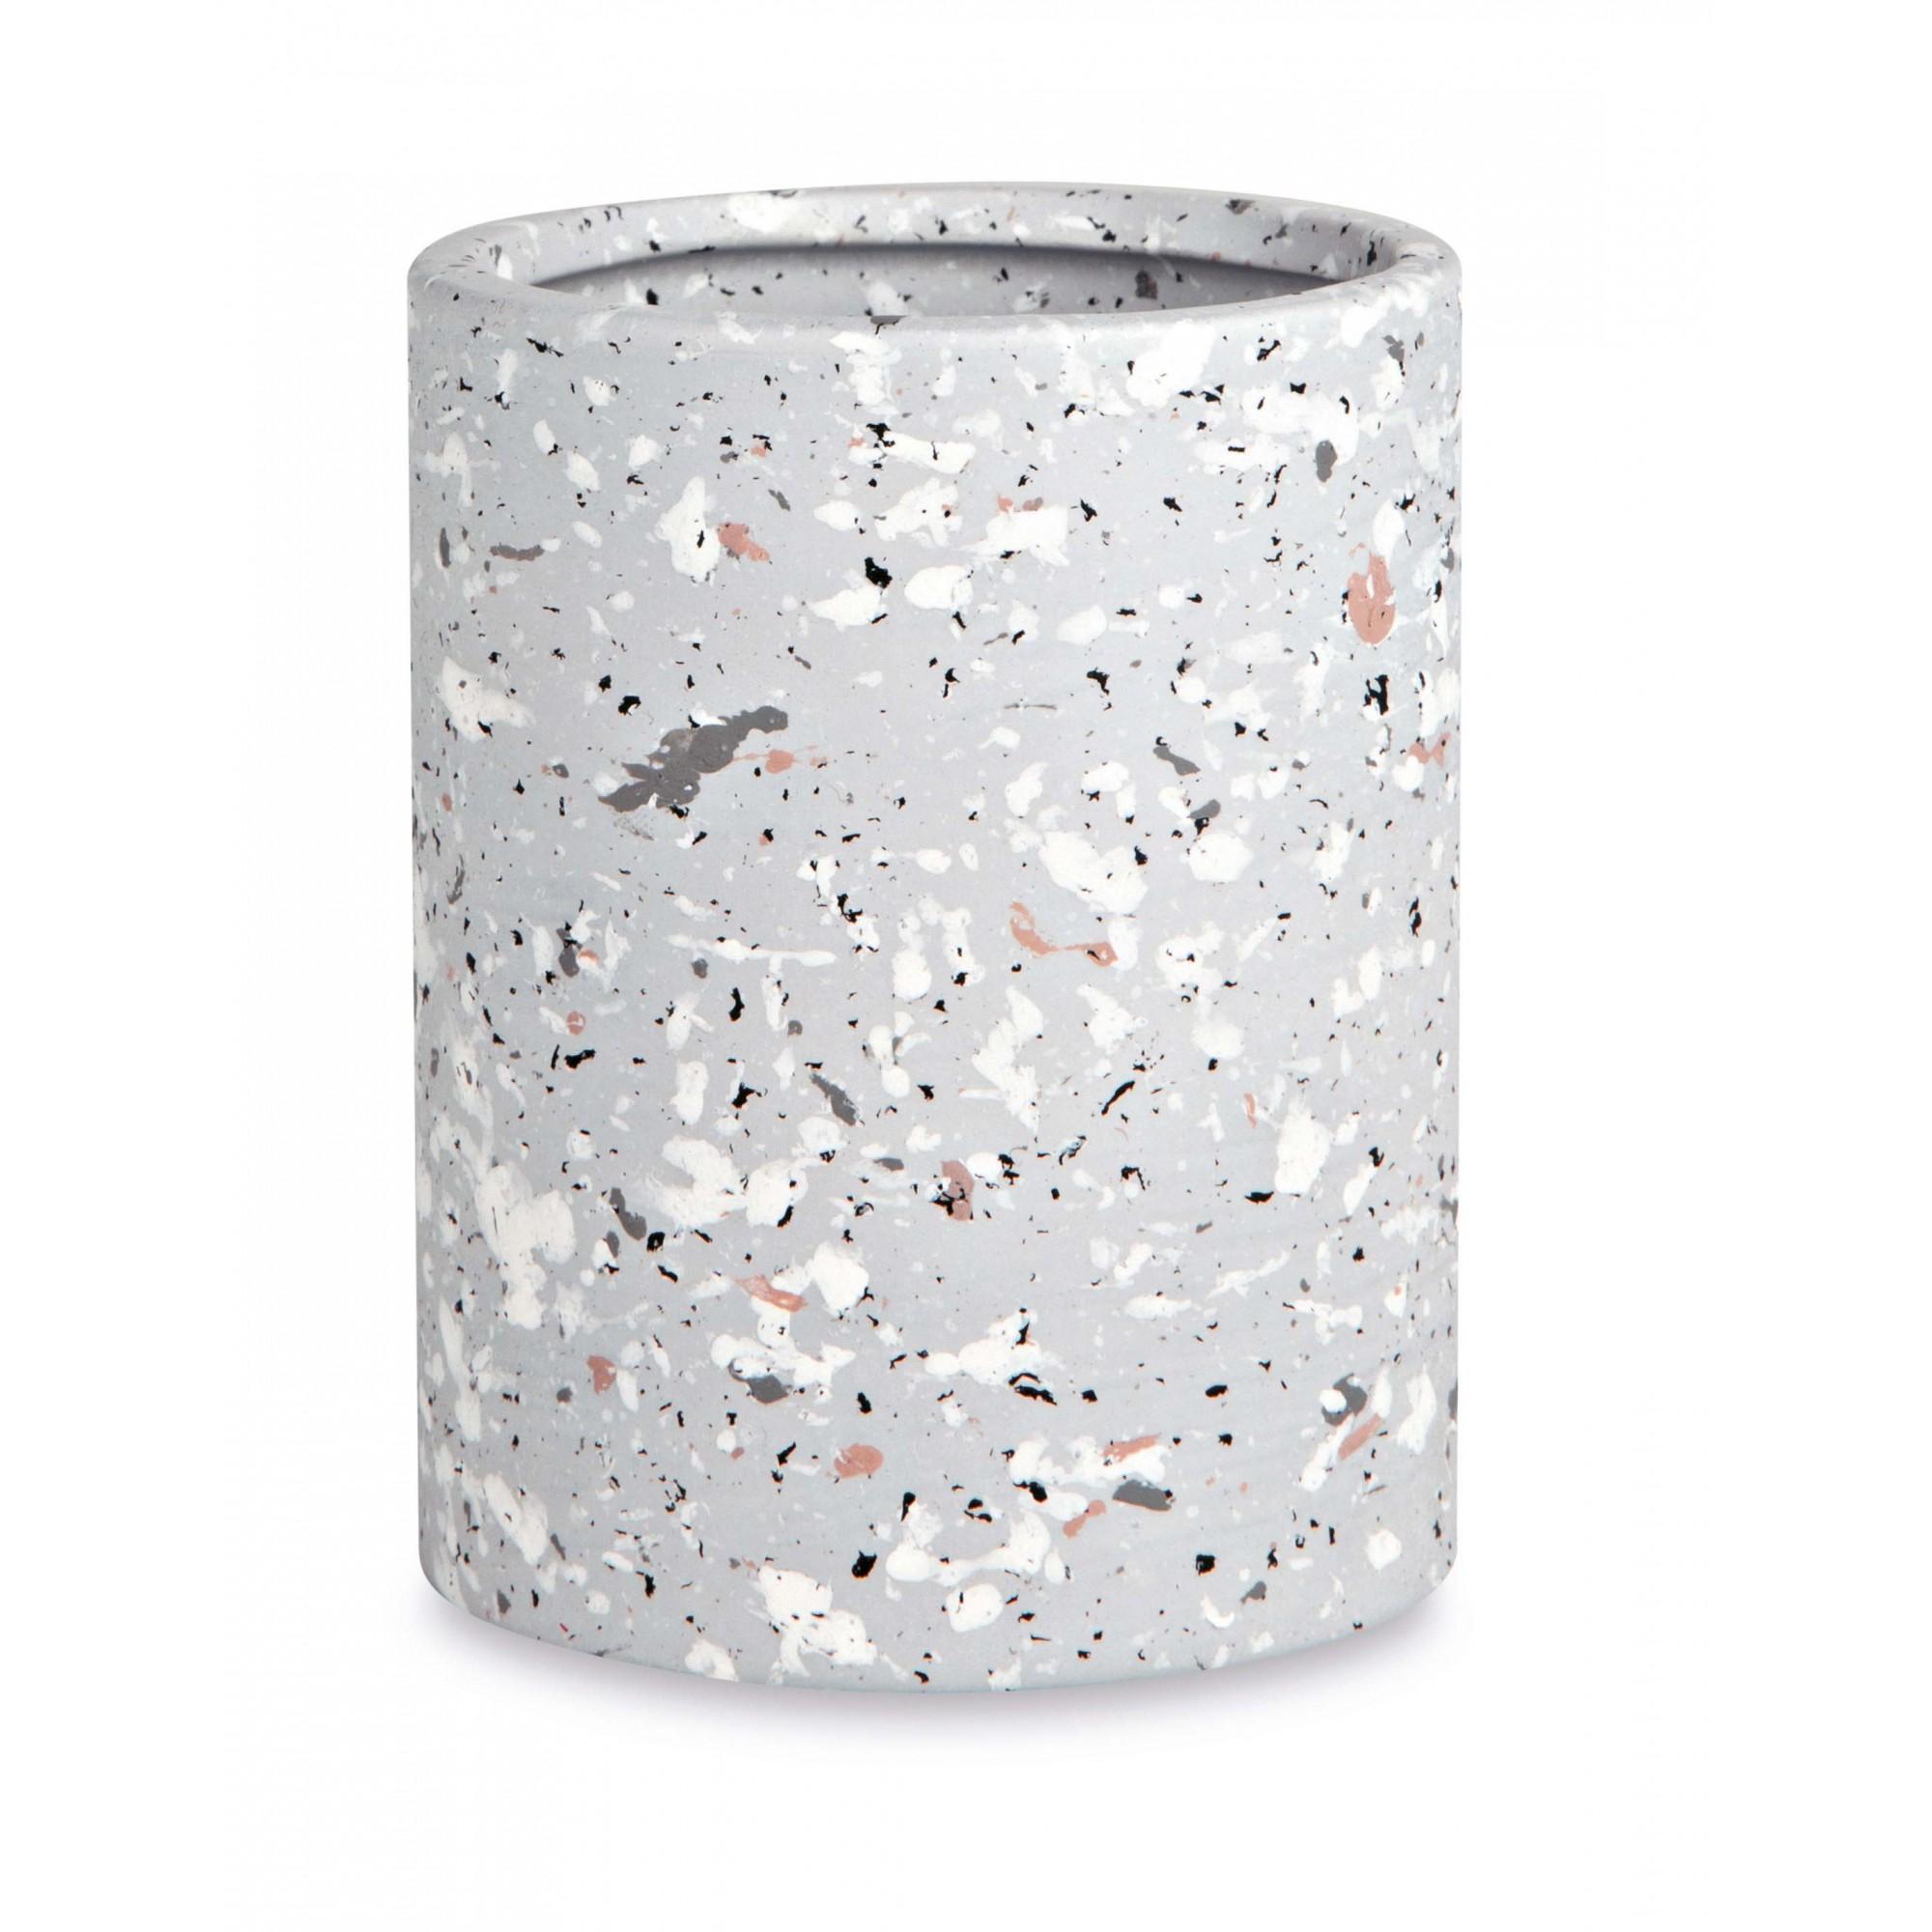 Kit Banheiro 2 peças Granelite Cinza